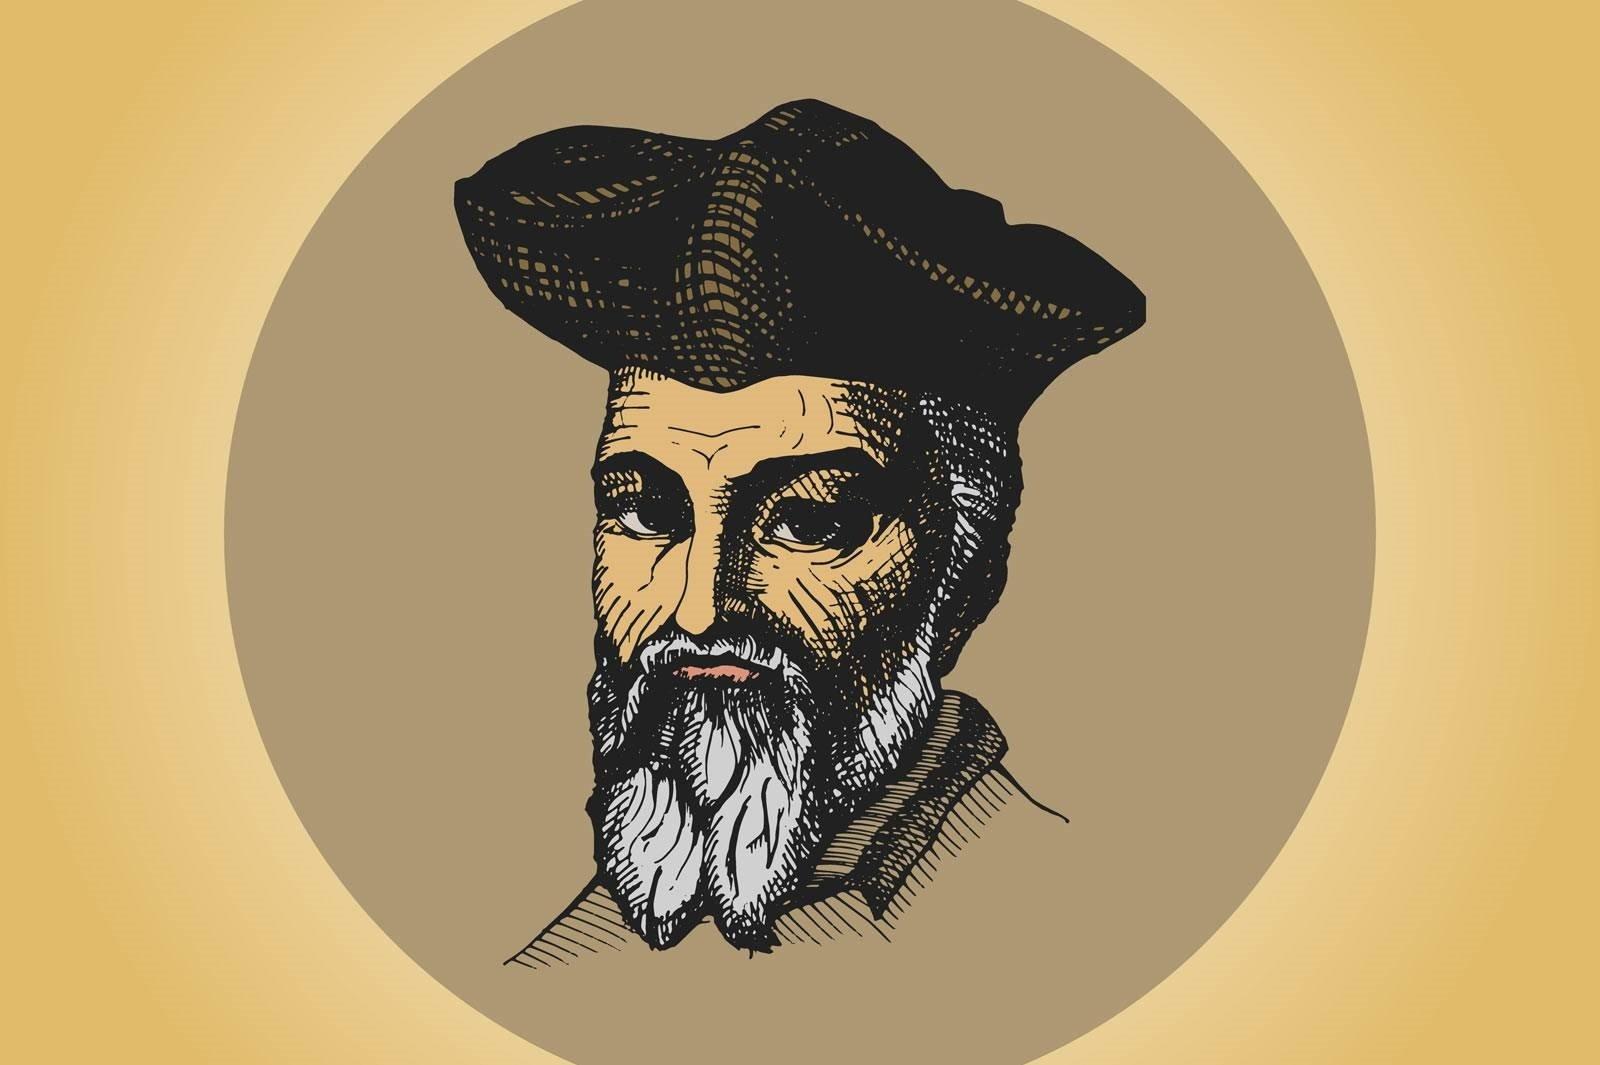 Nostradamus'un korkunç 2018 kehanetleri